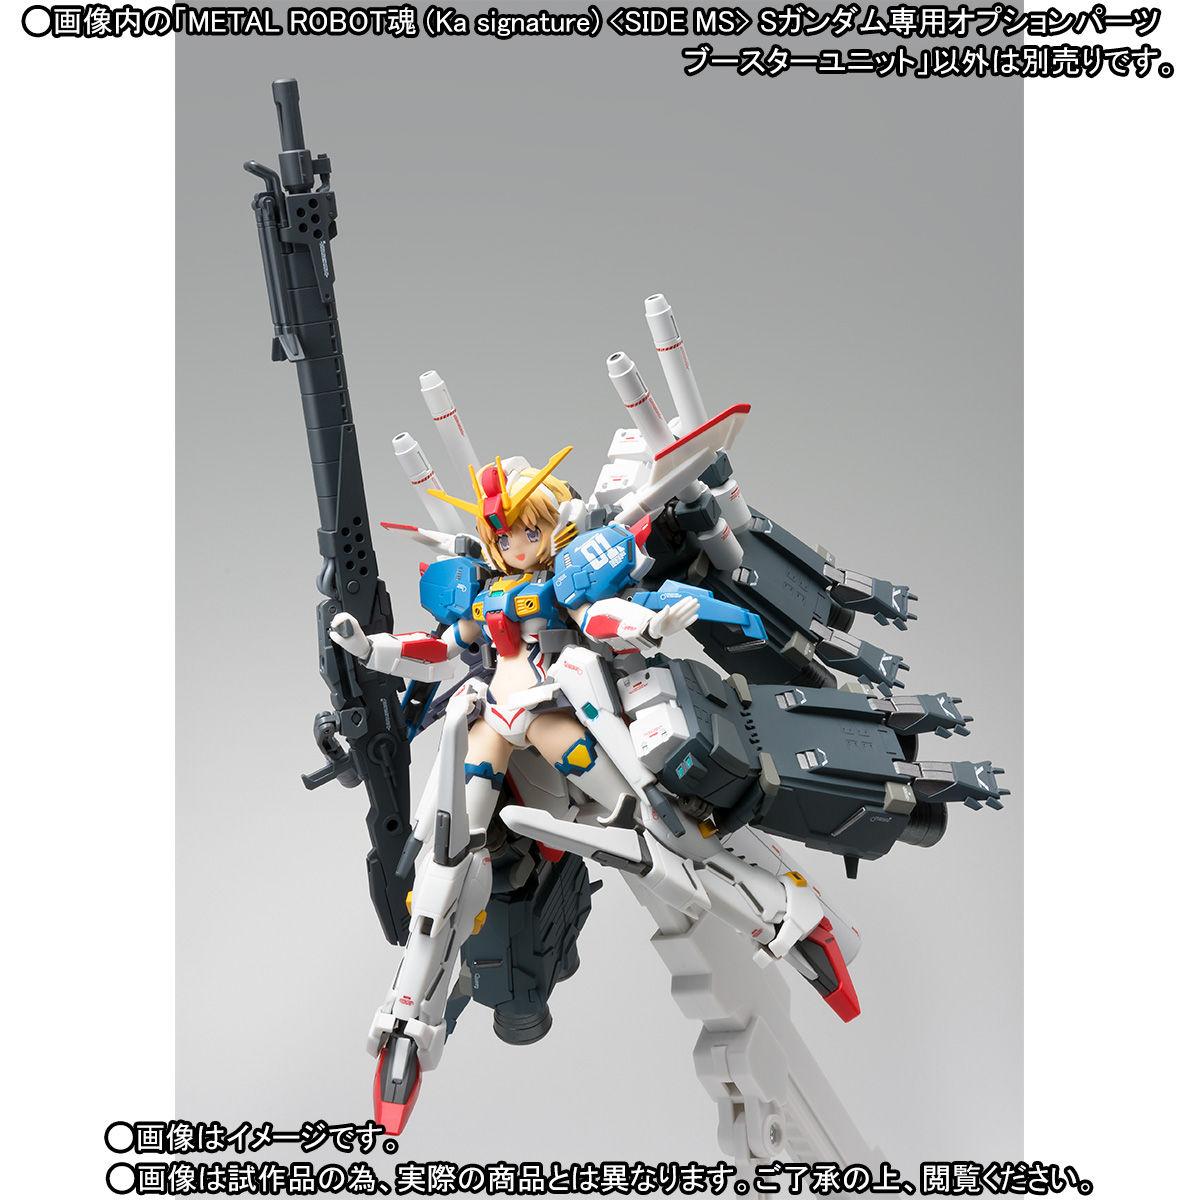 METAL ROBOT魂(Ka signature)<SIDE MS>『Sガンダム専用オプションパーツ ブースターユニット』オプションパーツ-007